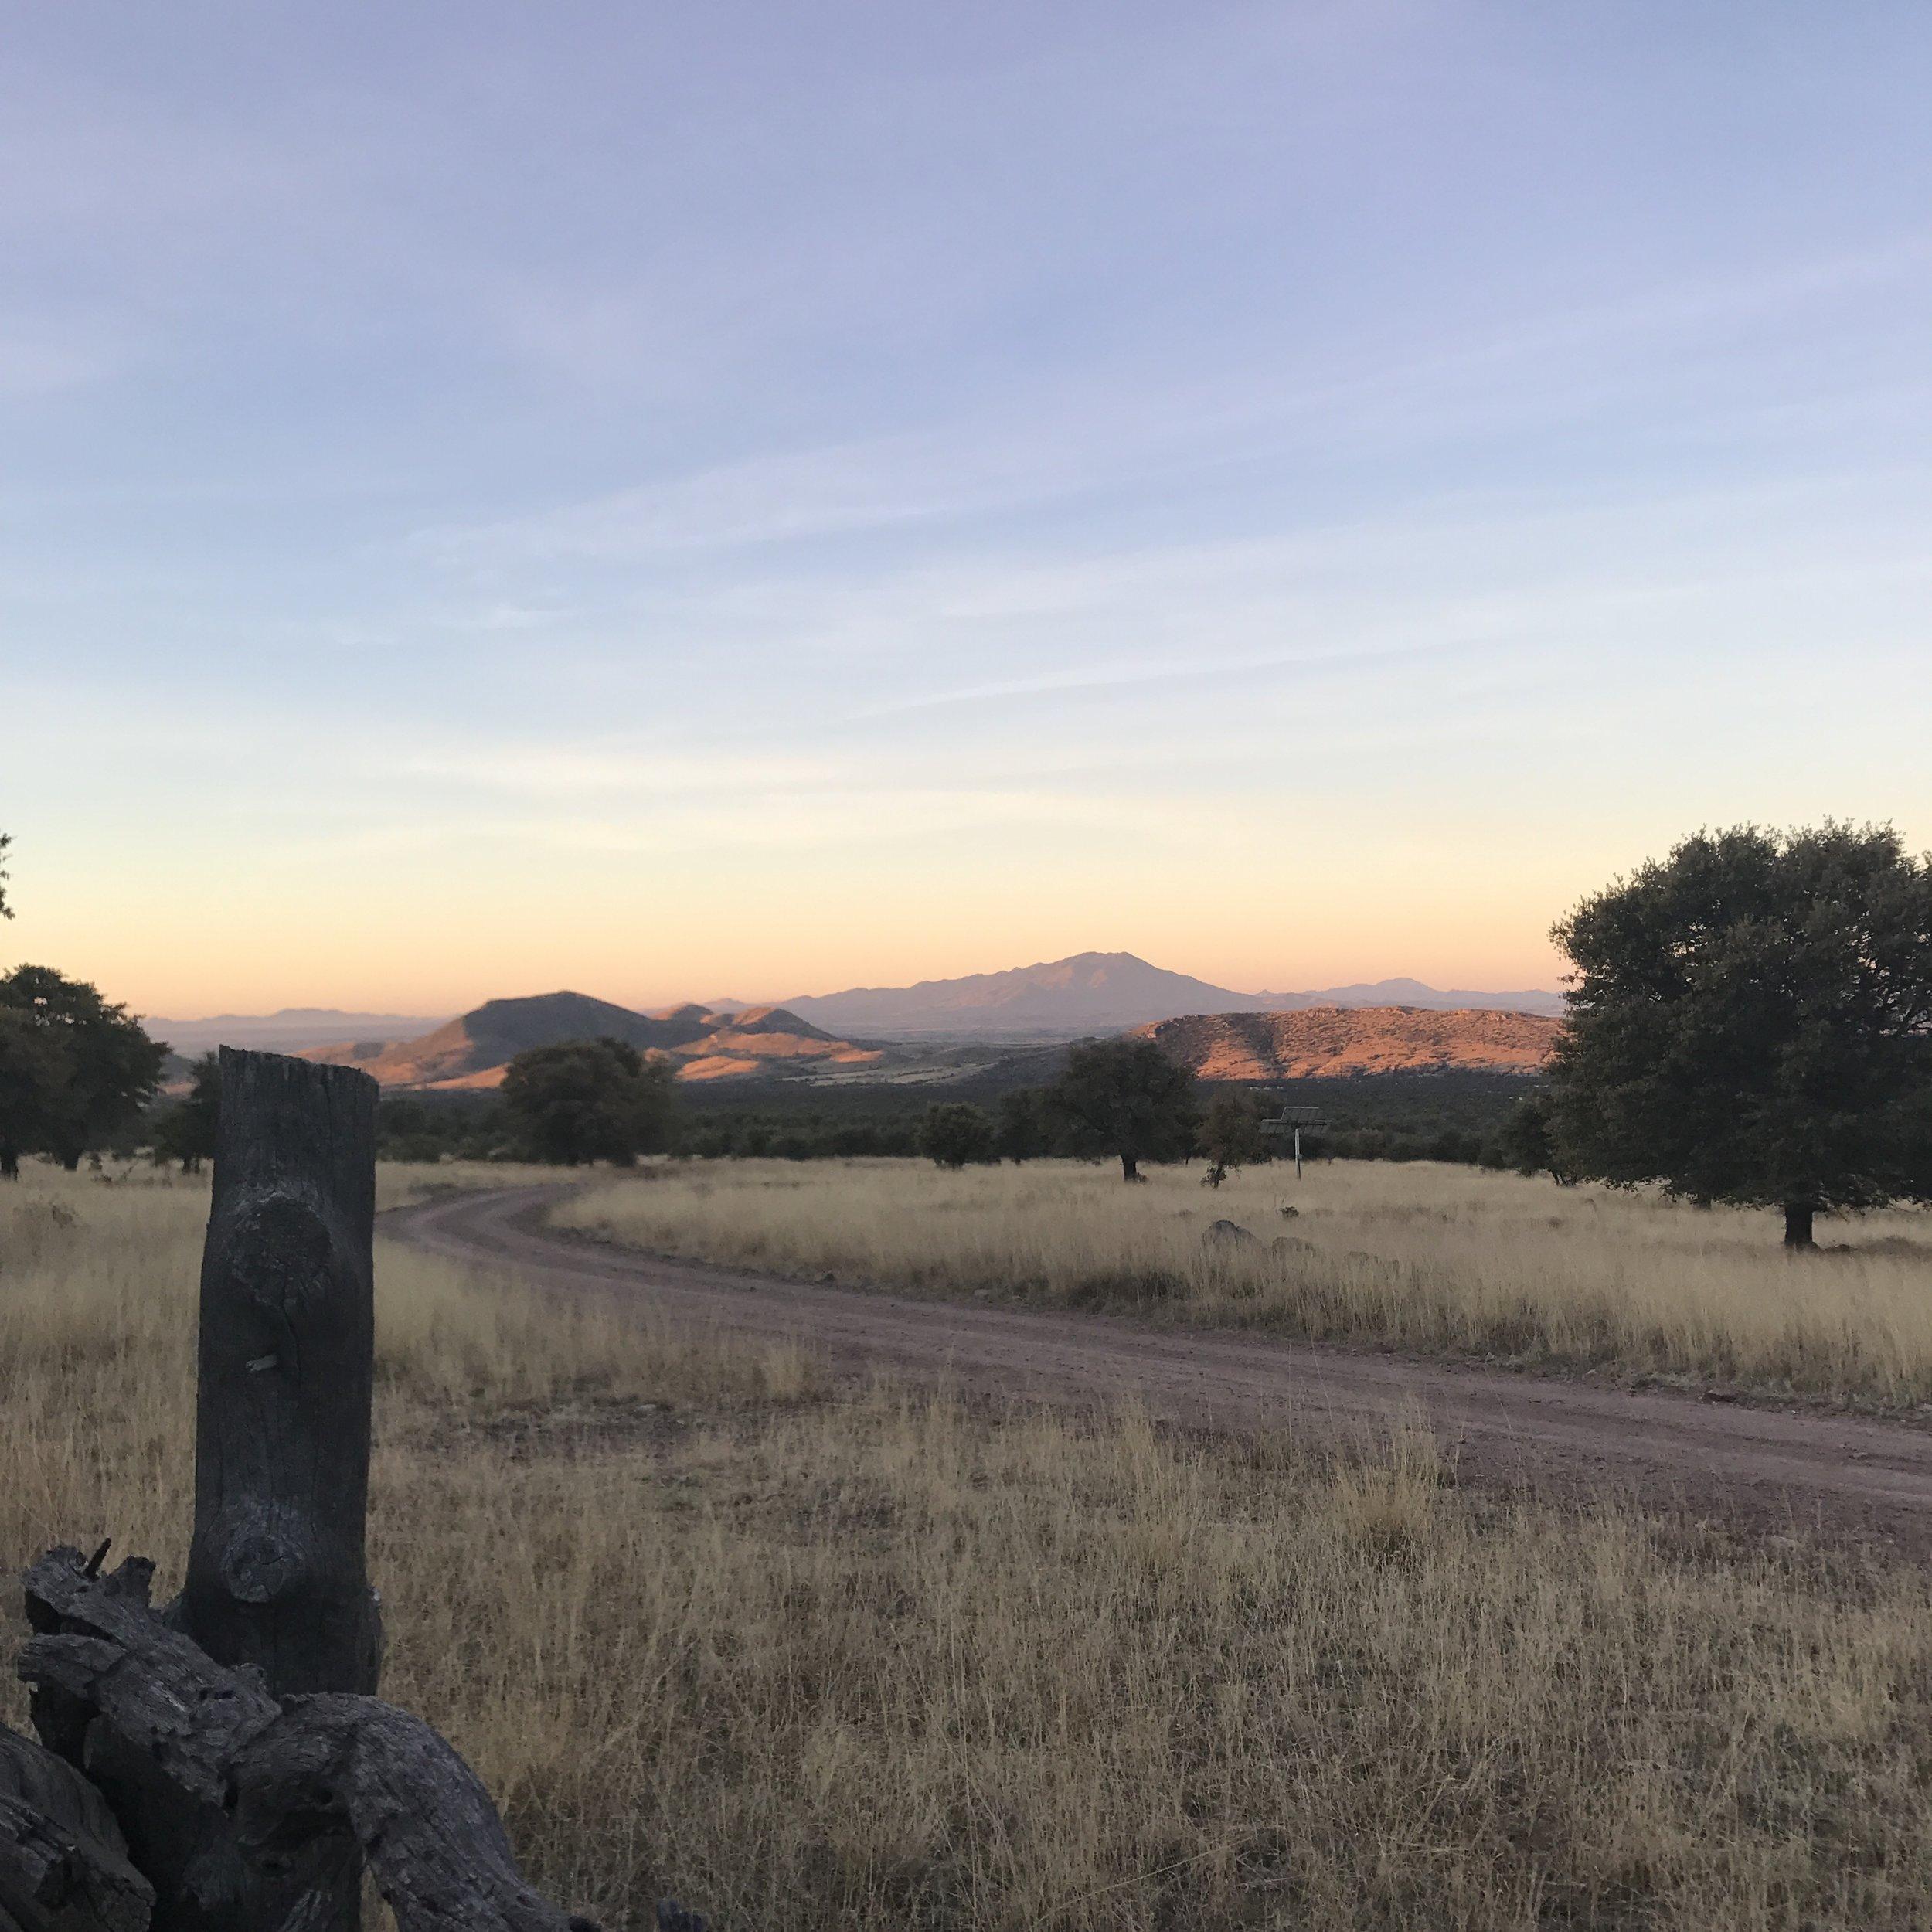 Sunrise over the Huachucas